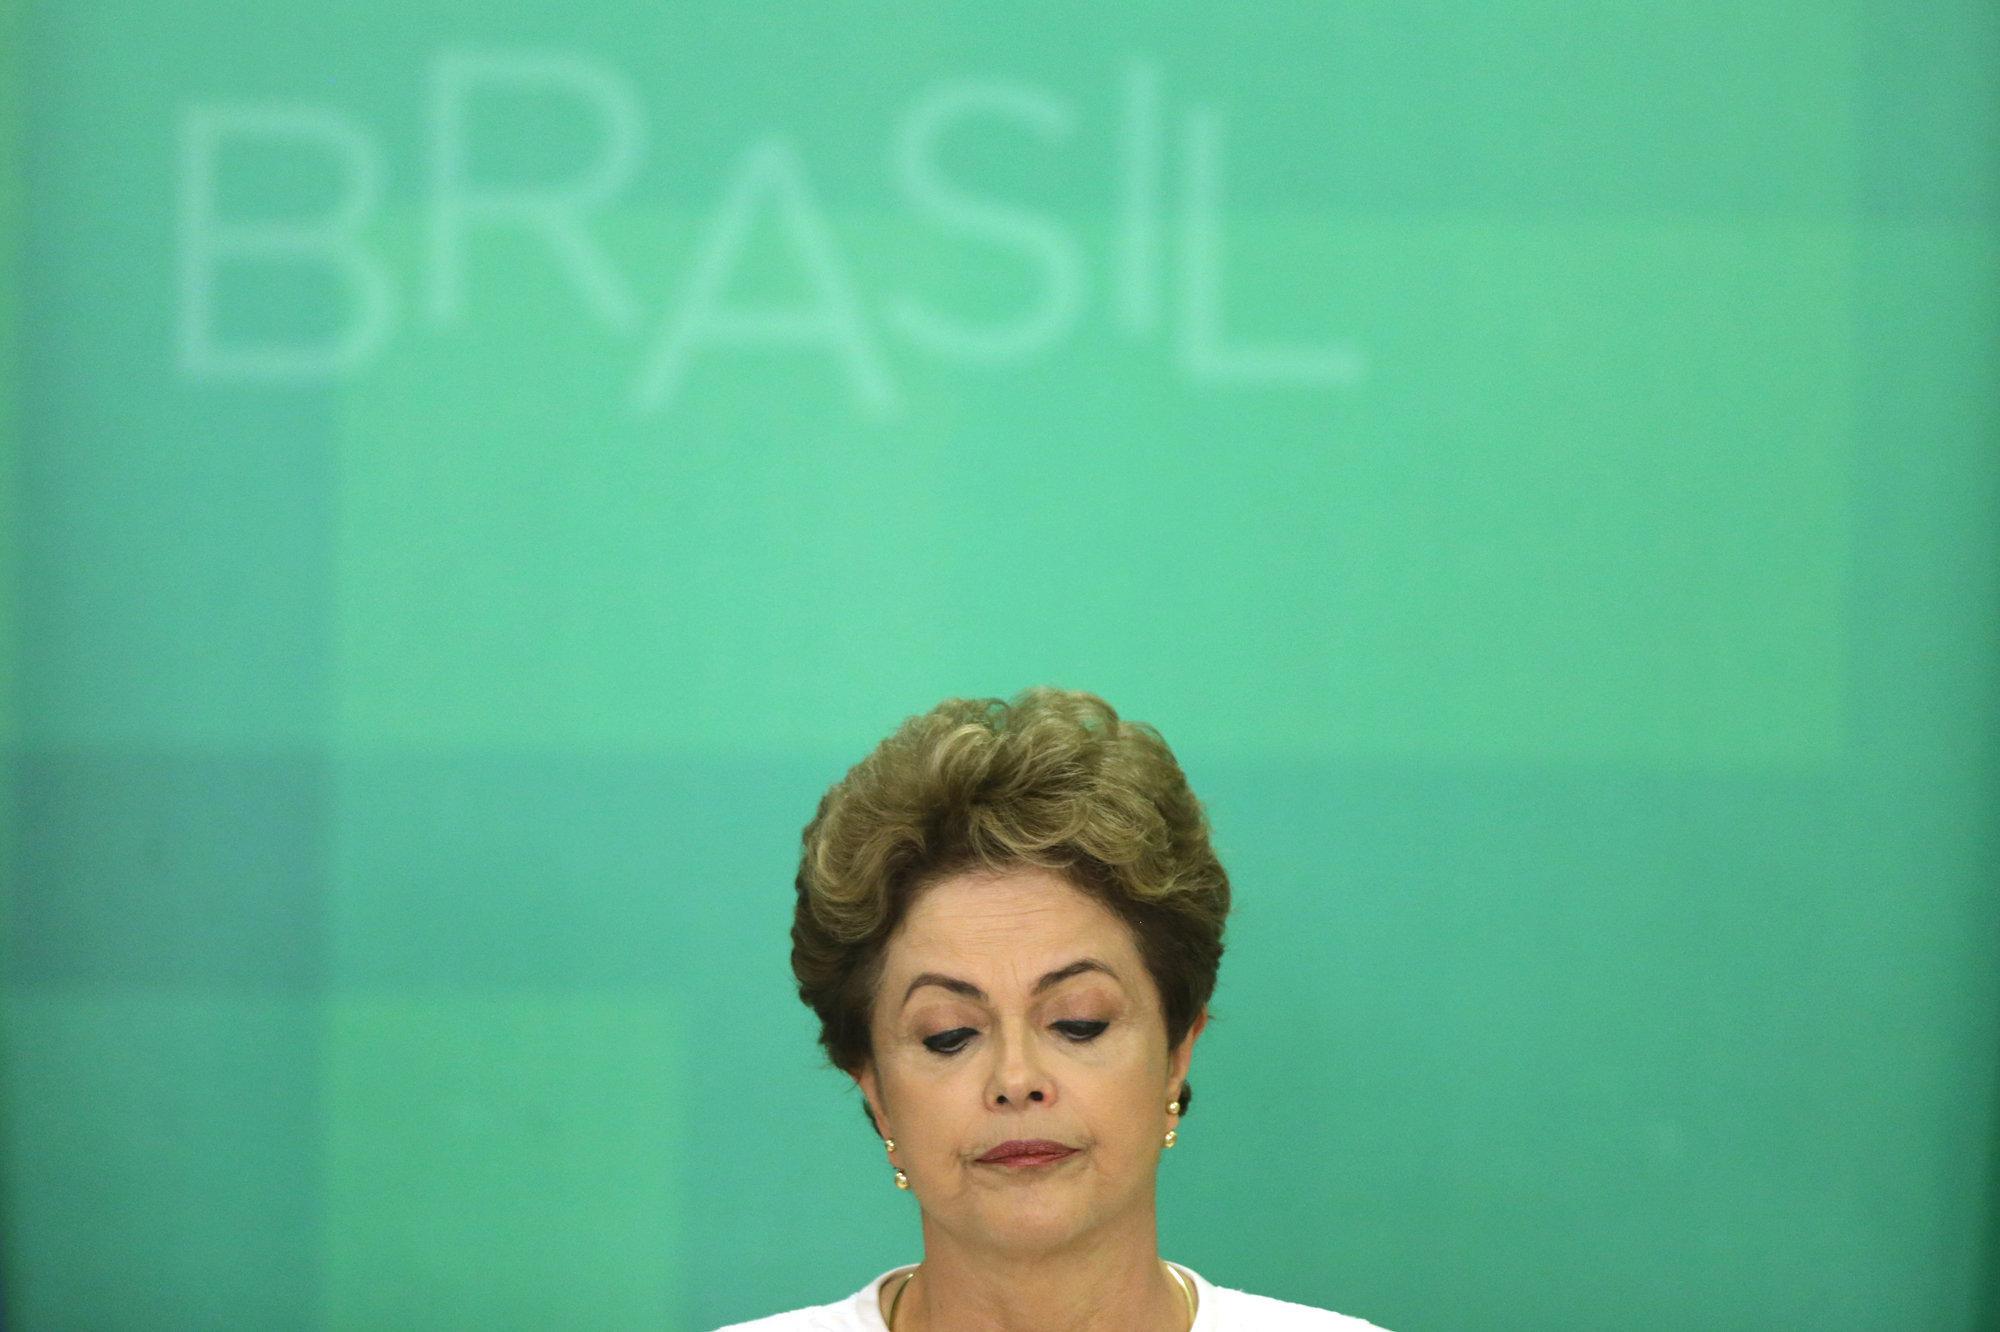 Сенат Бразилии проголосовал за начало импичмента Русеф